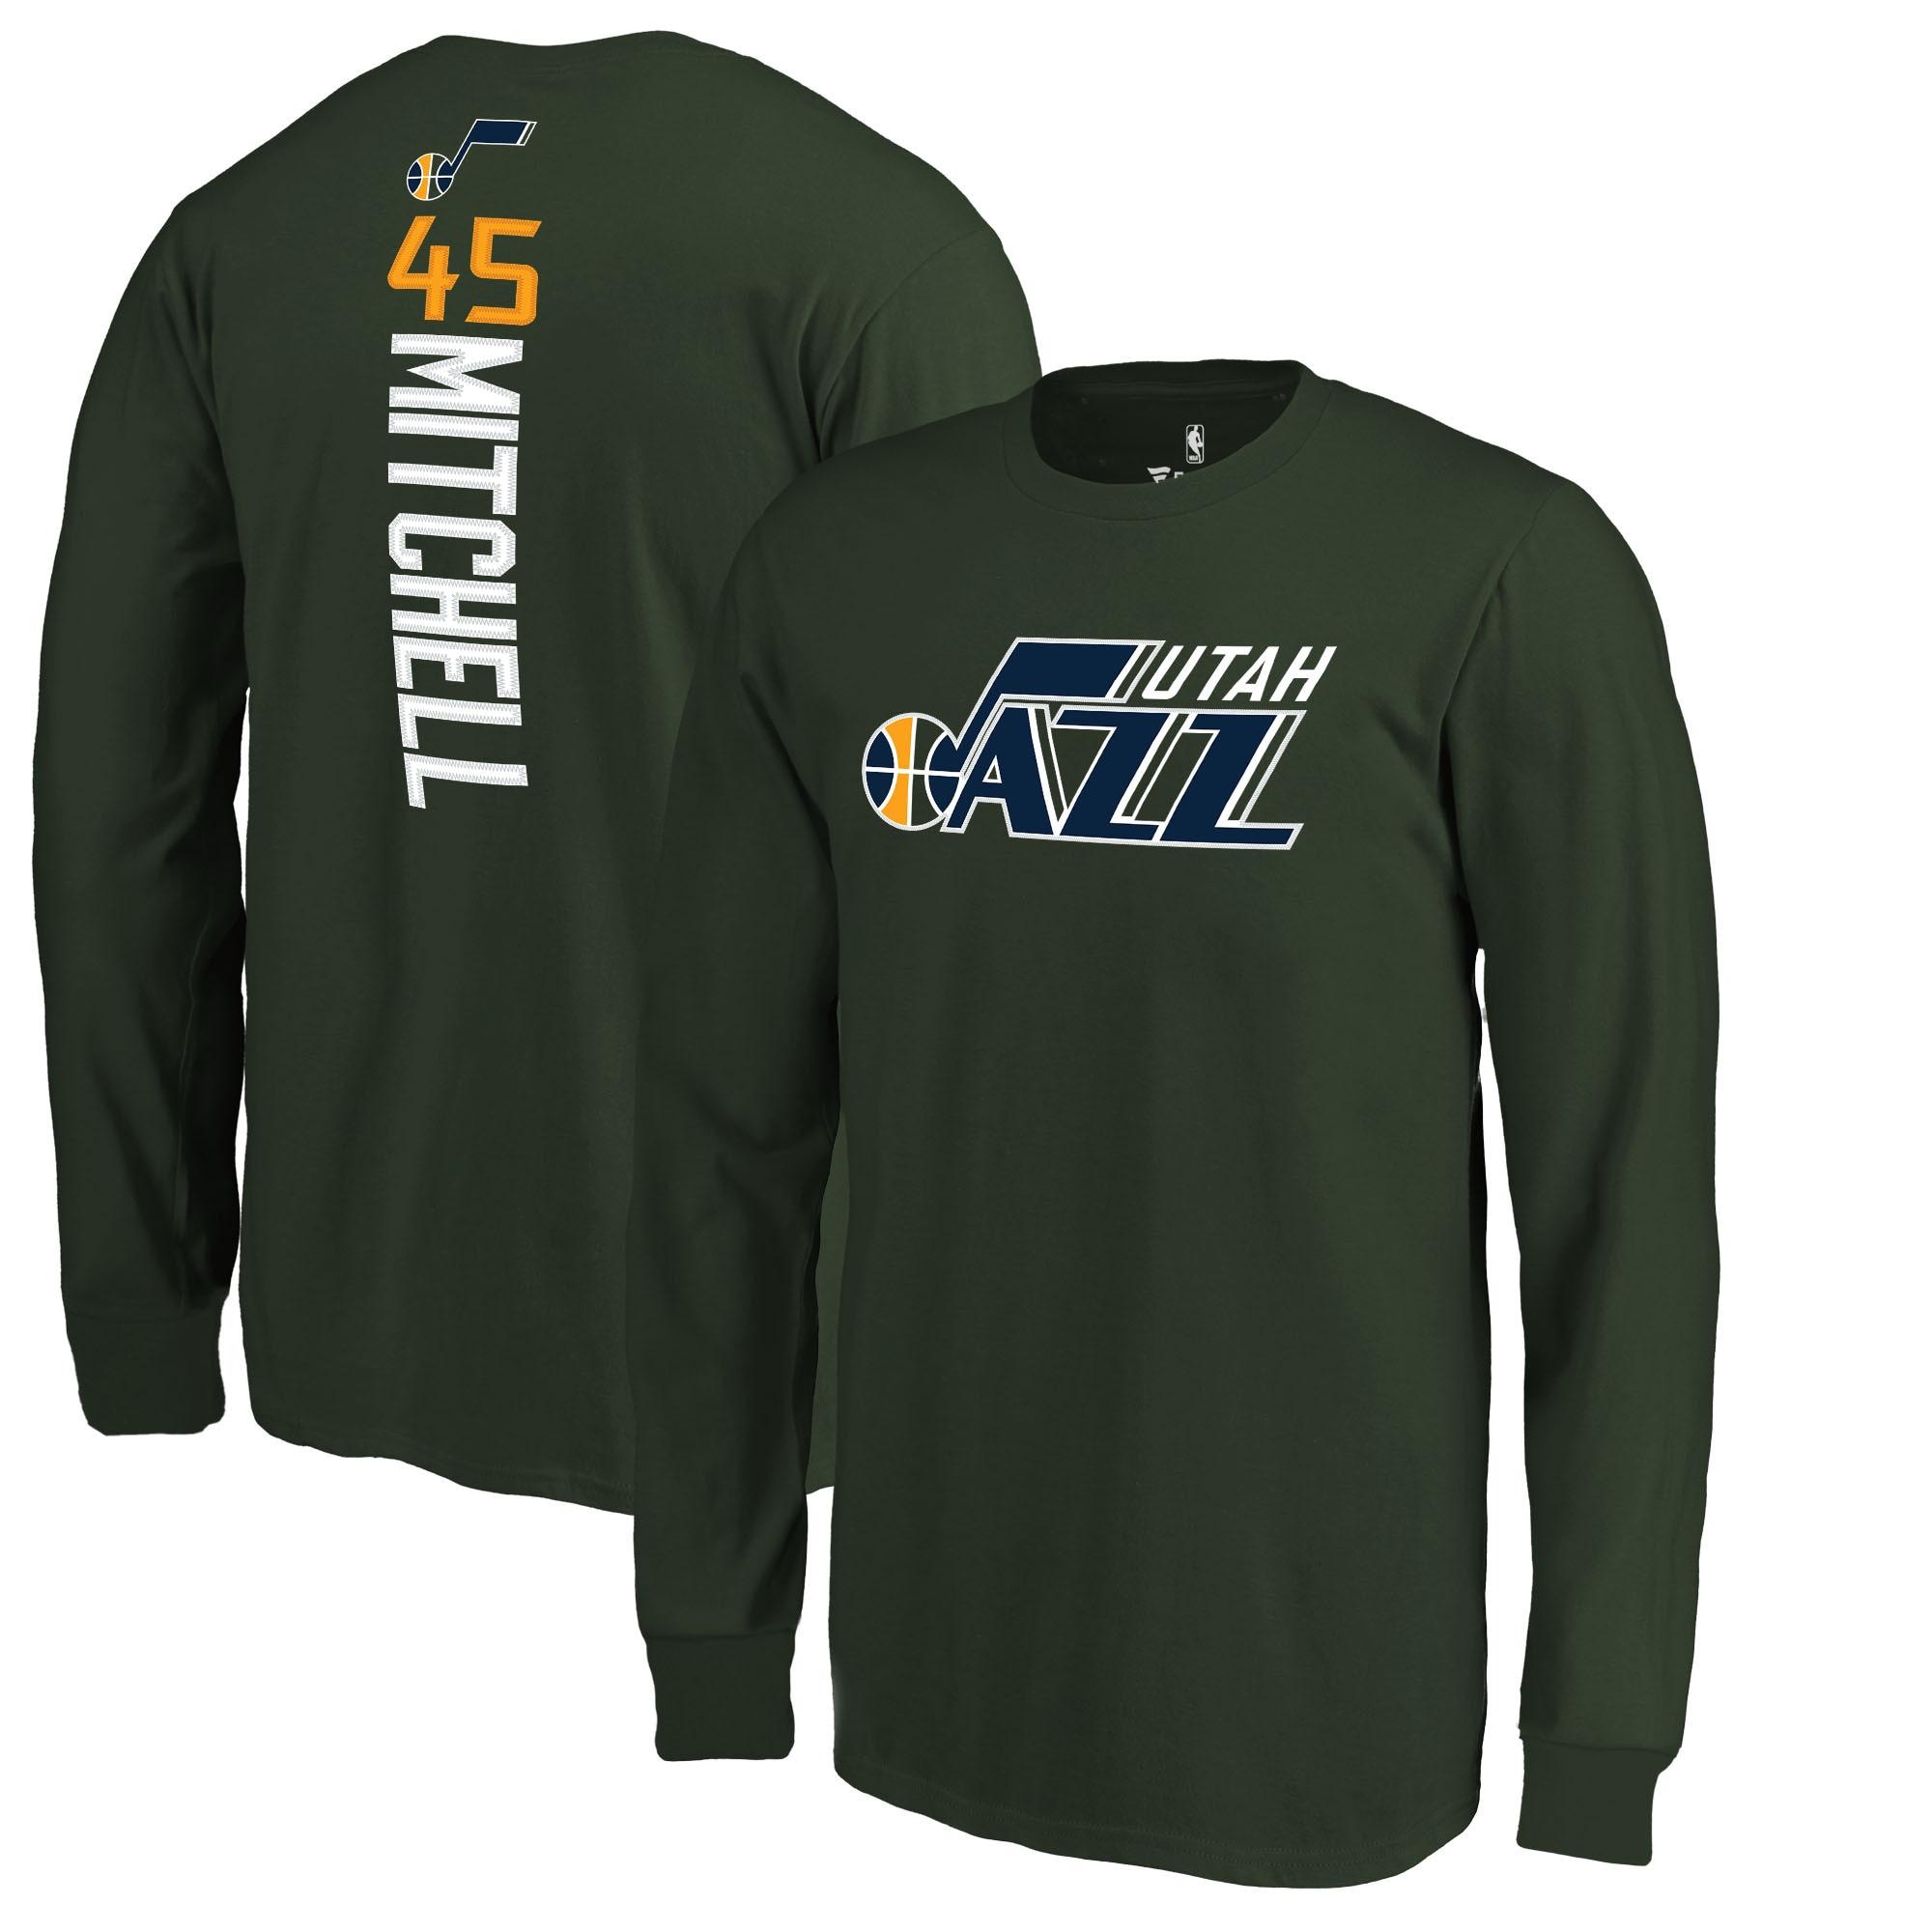 Donovan Mitchell Utah Jazz Fanatics Branded Youth Team Backer Name & Number Long Sleeve T-Shirt - Green